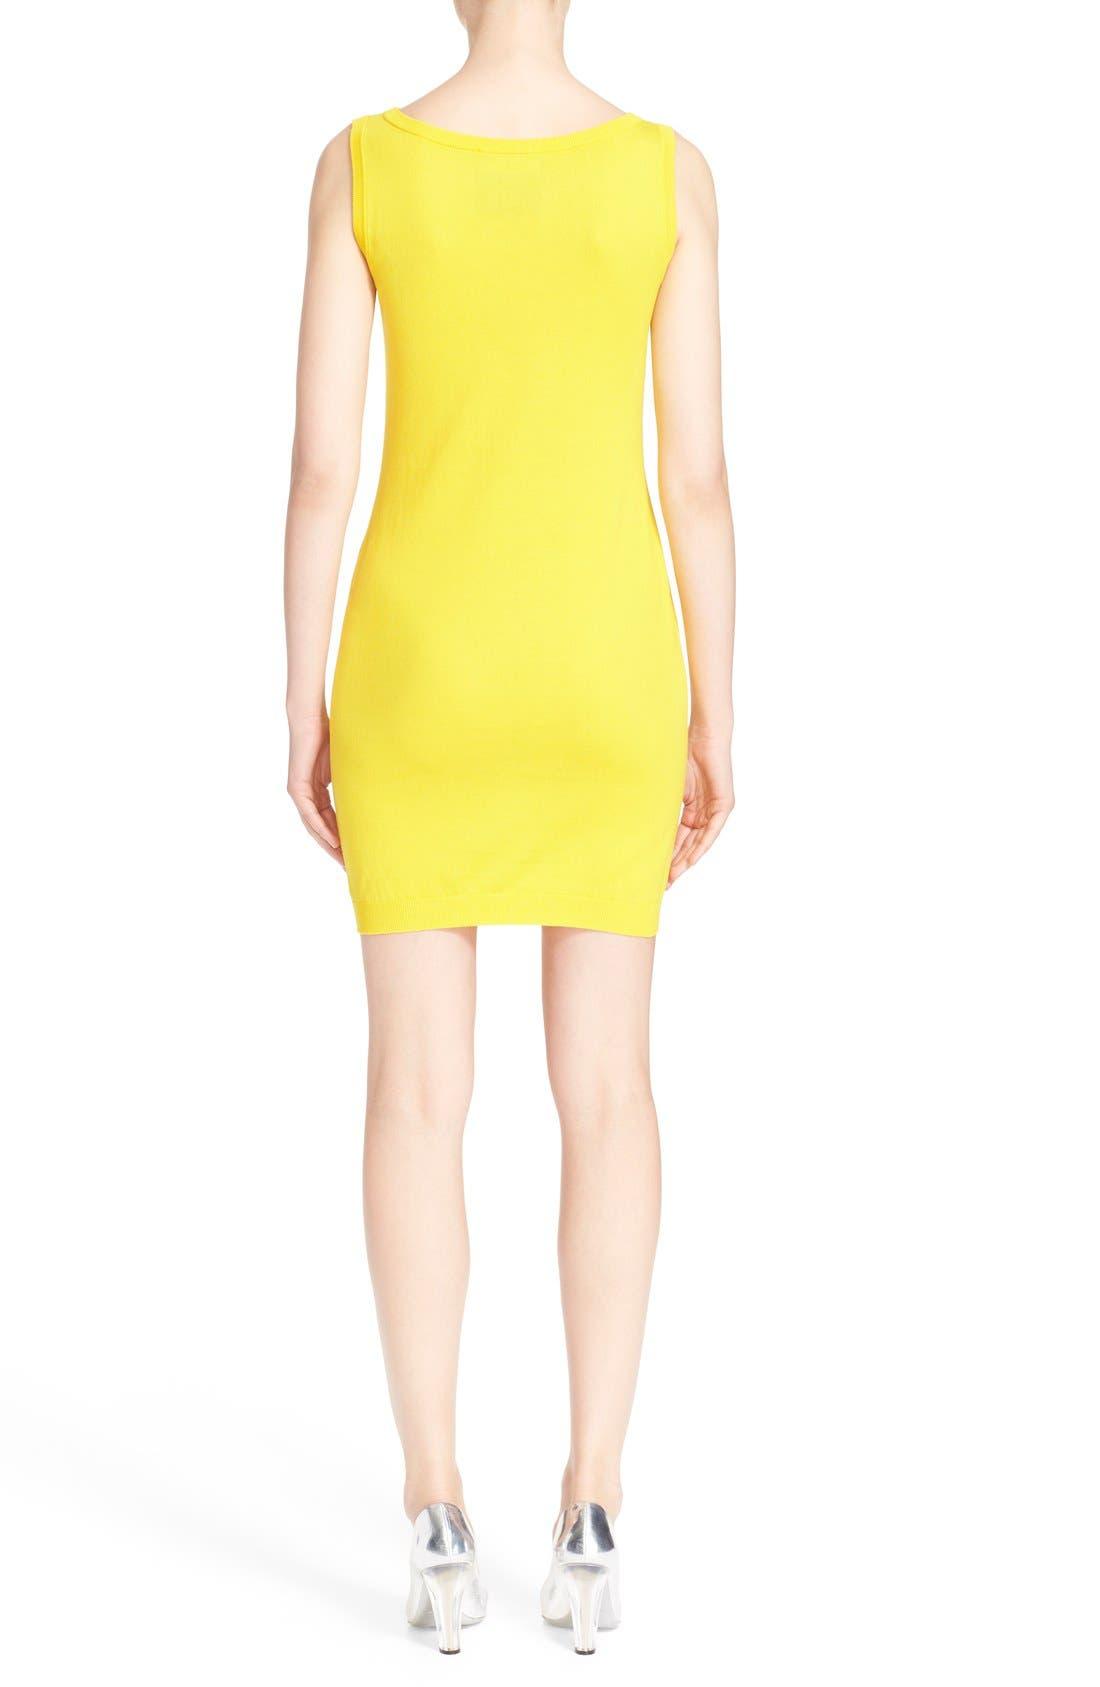 Alternate Image 2  - Moschino 'The Powerpuff Girls® - Buttercup' Intarsia Knit Dress